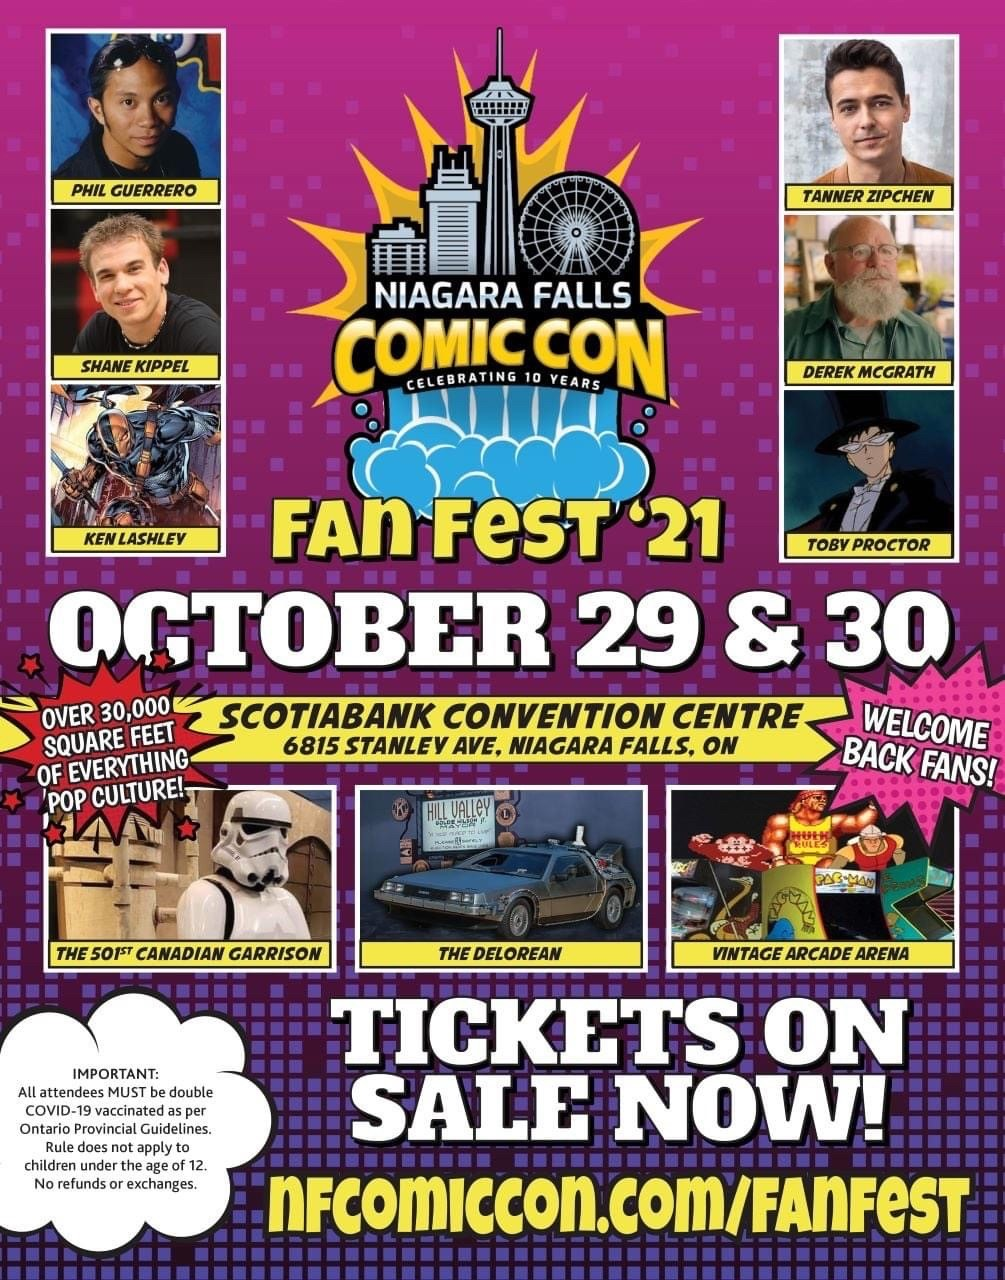 Niagara Falls Comic Con Fan Fest Hotel Packages - Wyndham Garden Niagara Falls Fallsview